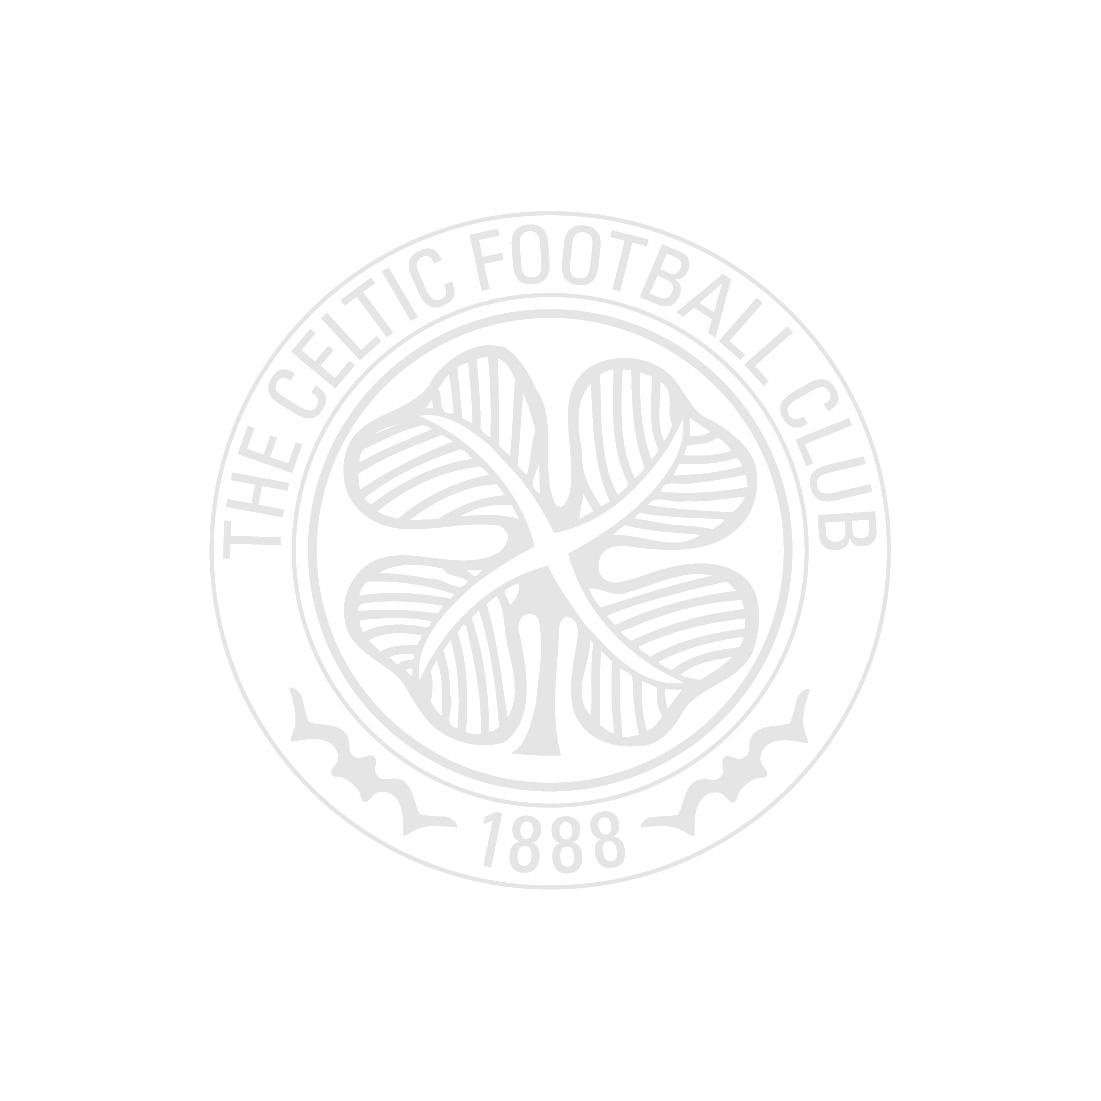 Celtic FC Jacquard Scarf